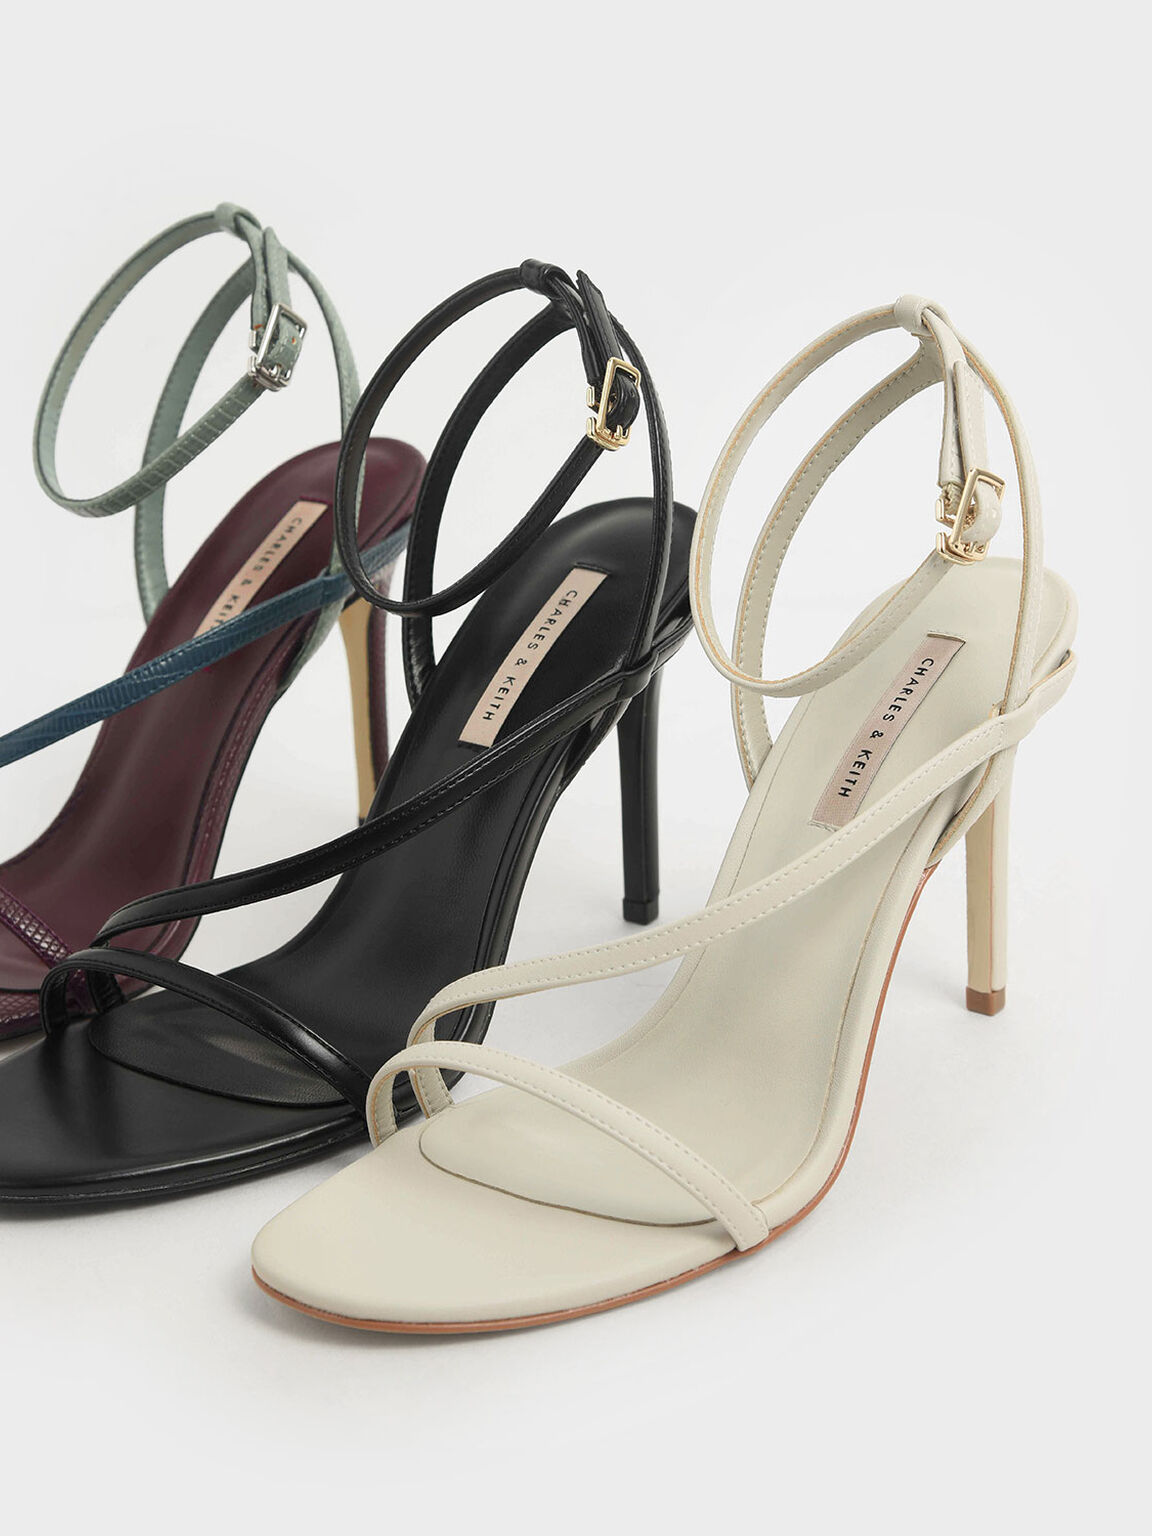 Snake Print Strappy Stiletto Heel Sandals, Multi, hi-res